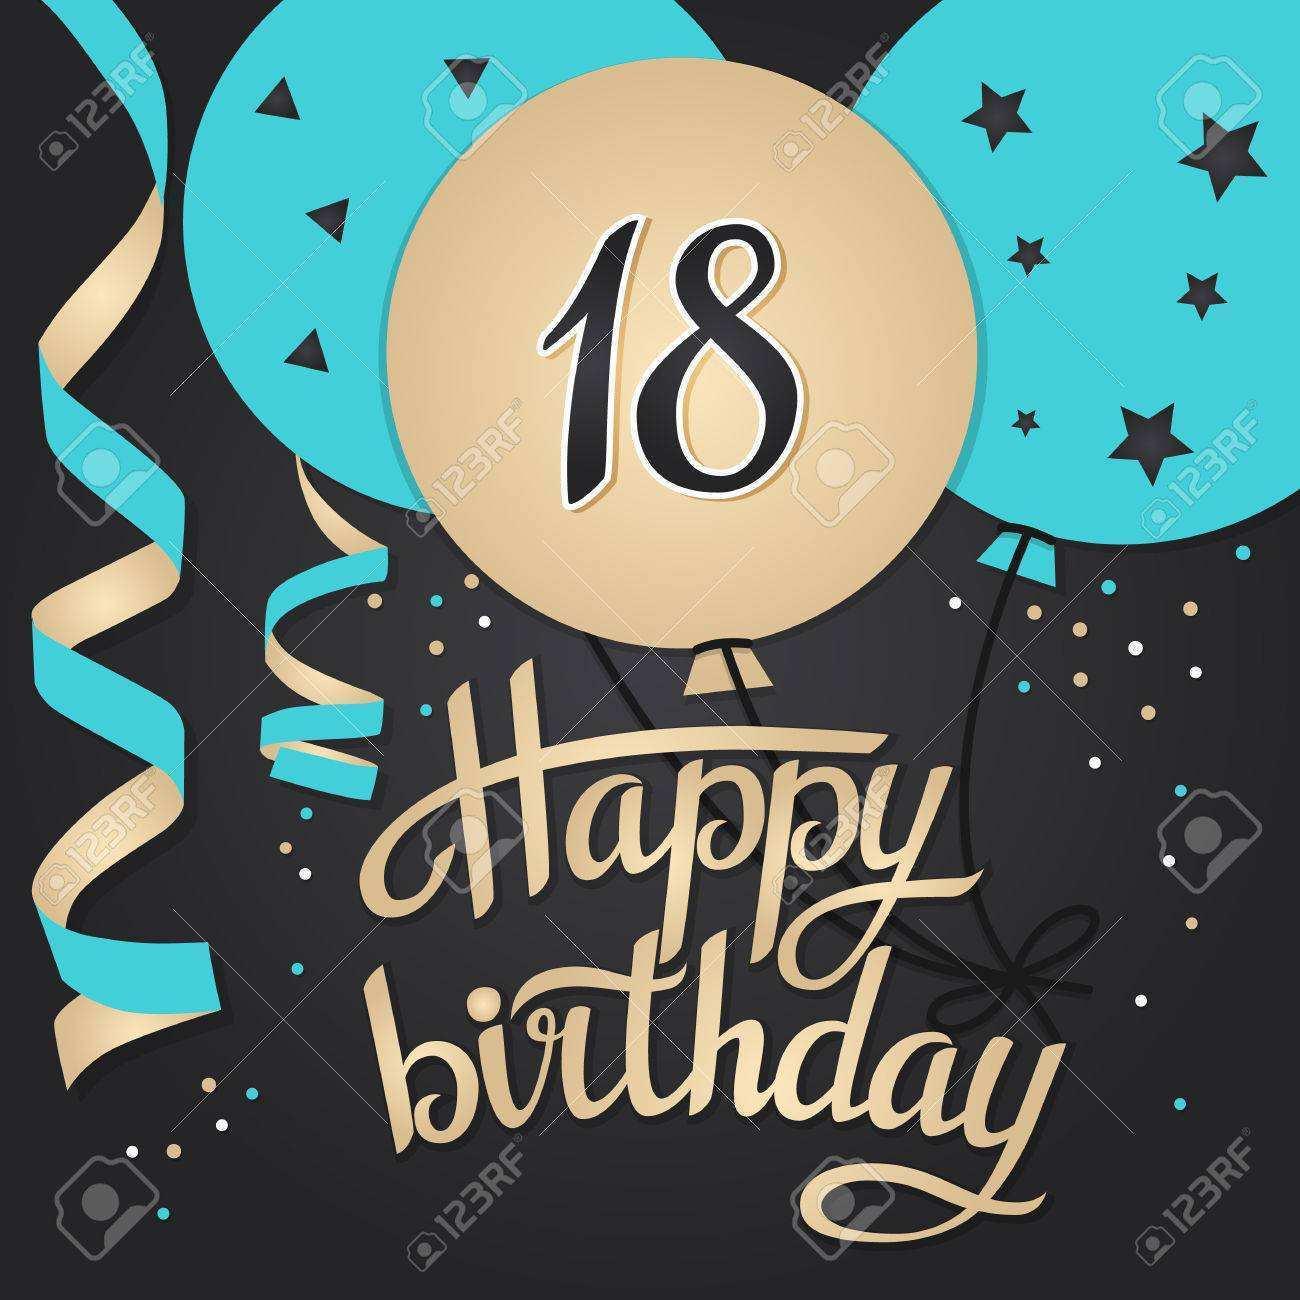 86 Free Printable 18Th Birthday Card Template PSD File with 18Th Birthday Card Template